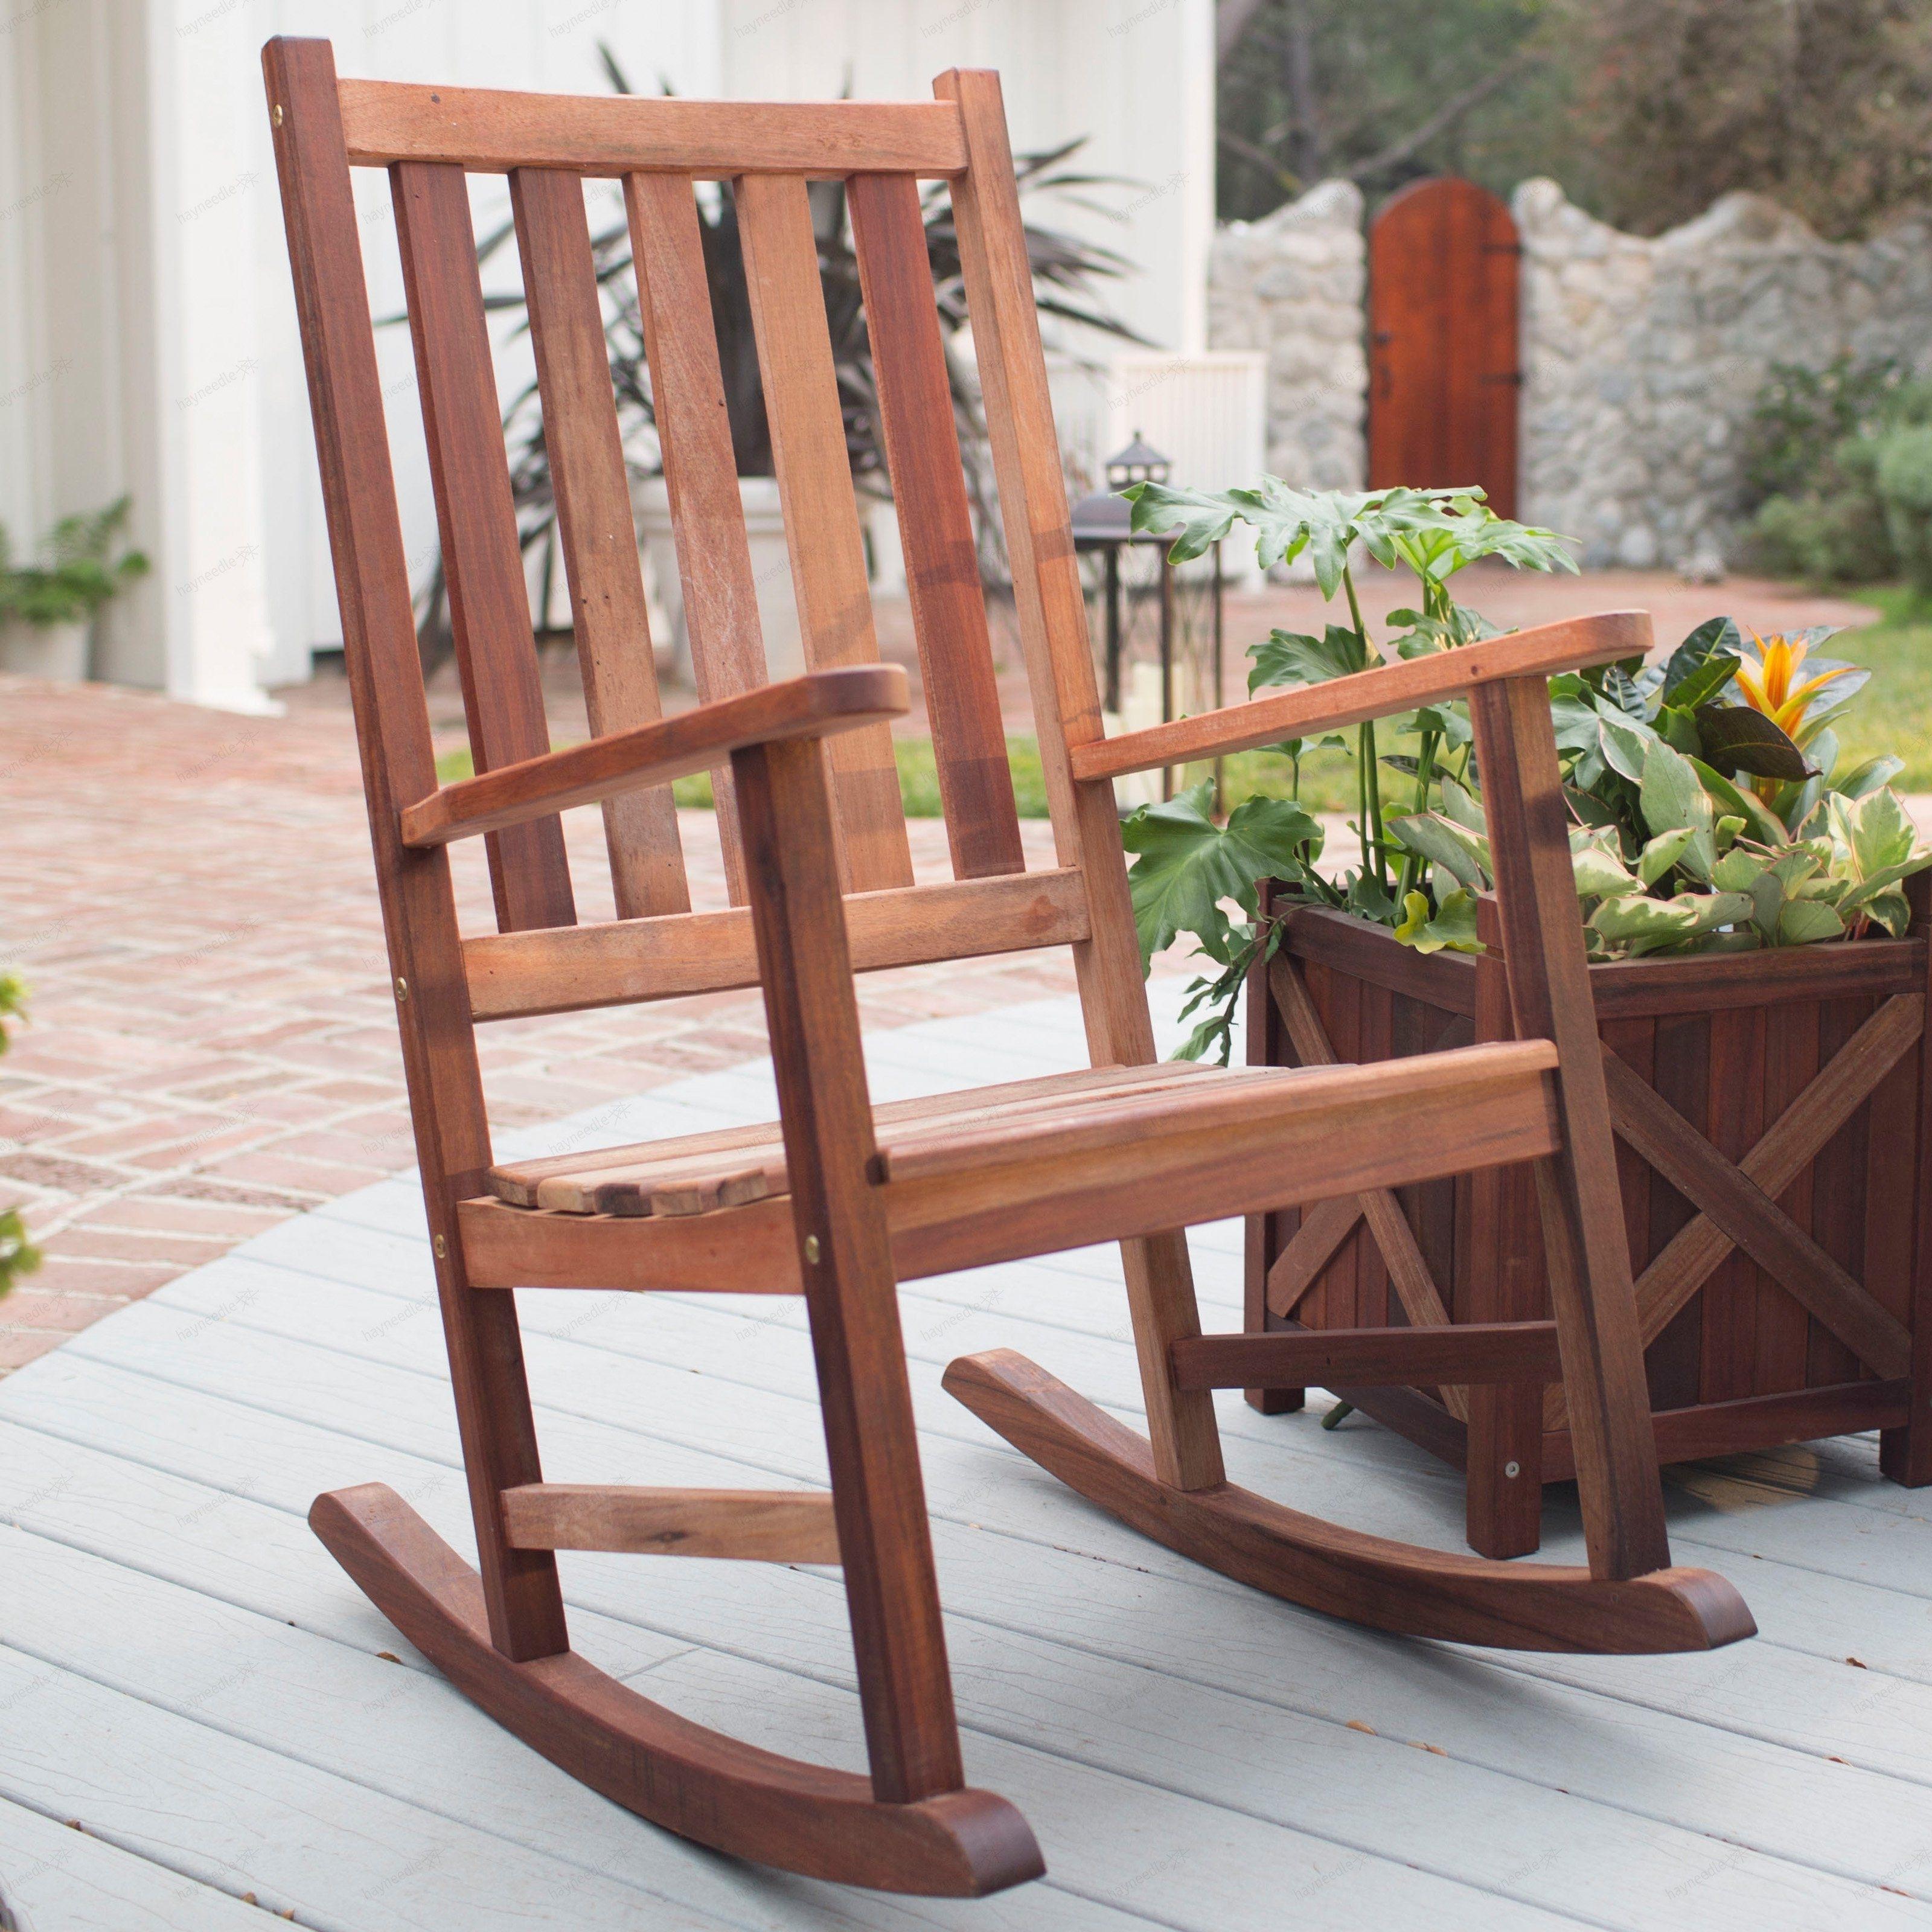 Belham Living Richmond Heavy Duty Outdoor Wooden Rocking Chair Inside Rocking Chair Outdoor Wooden (View 2 of 15)